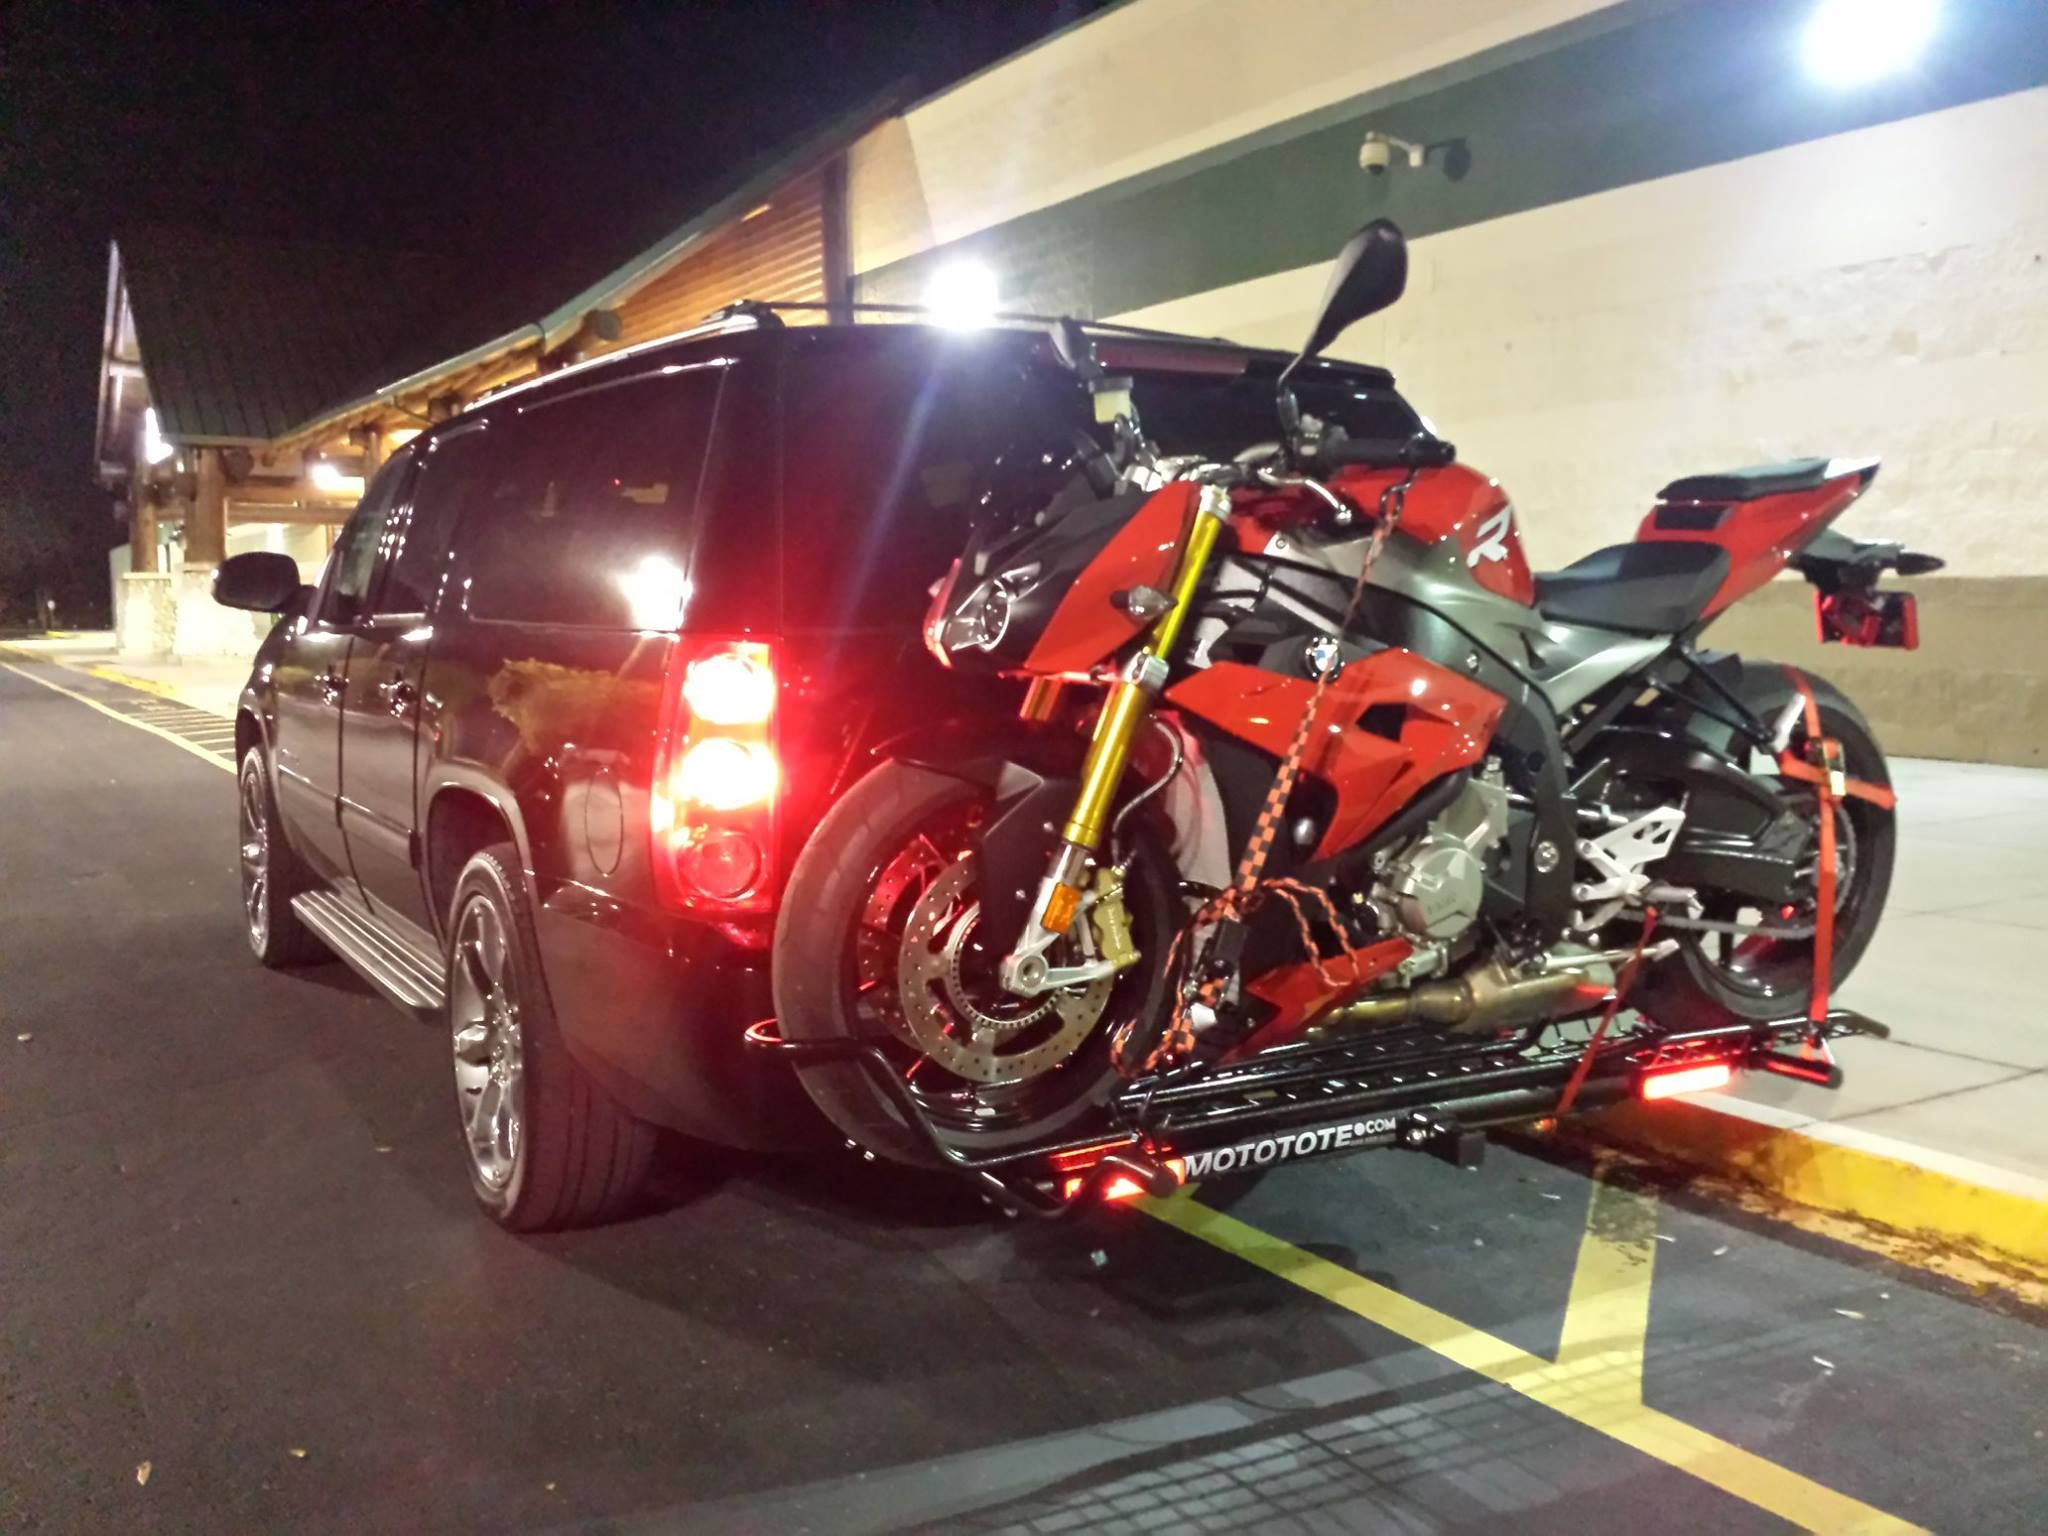 Nadeem s bmw on his mototote mtx sport in orlando florida